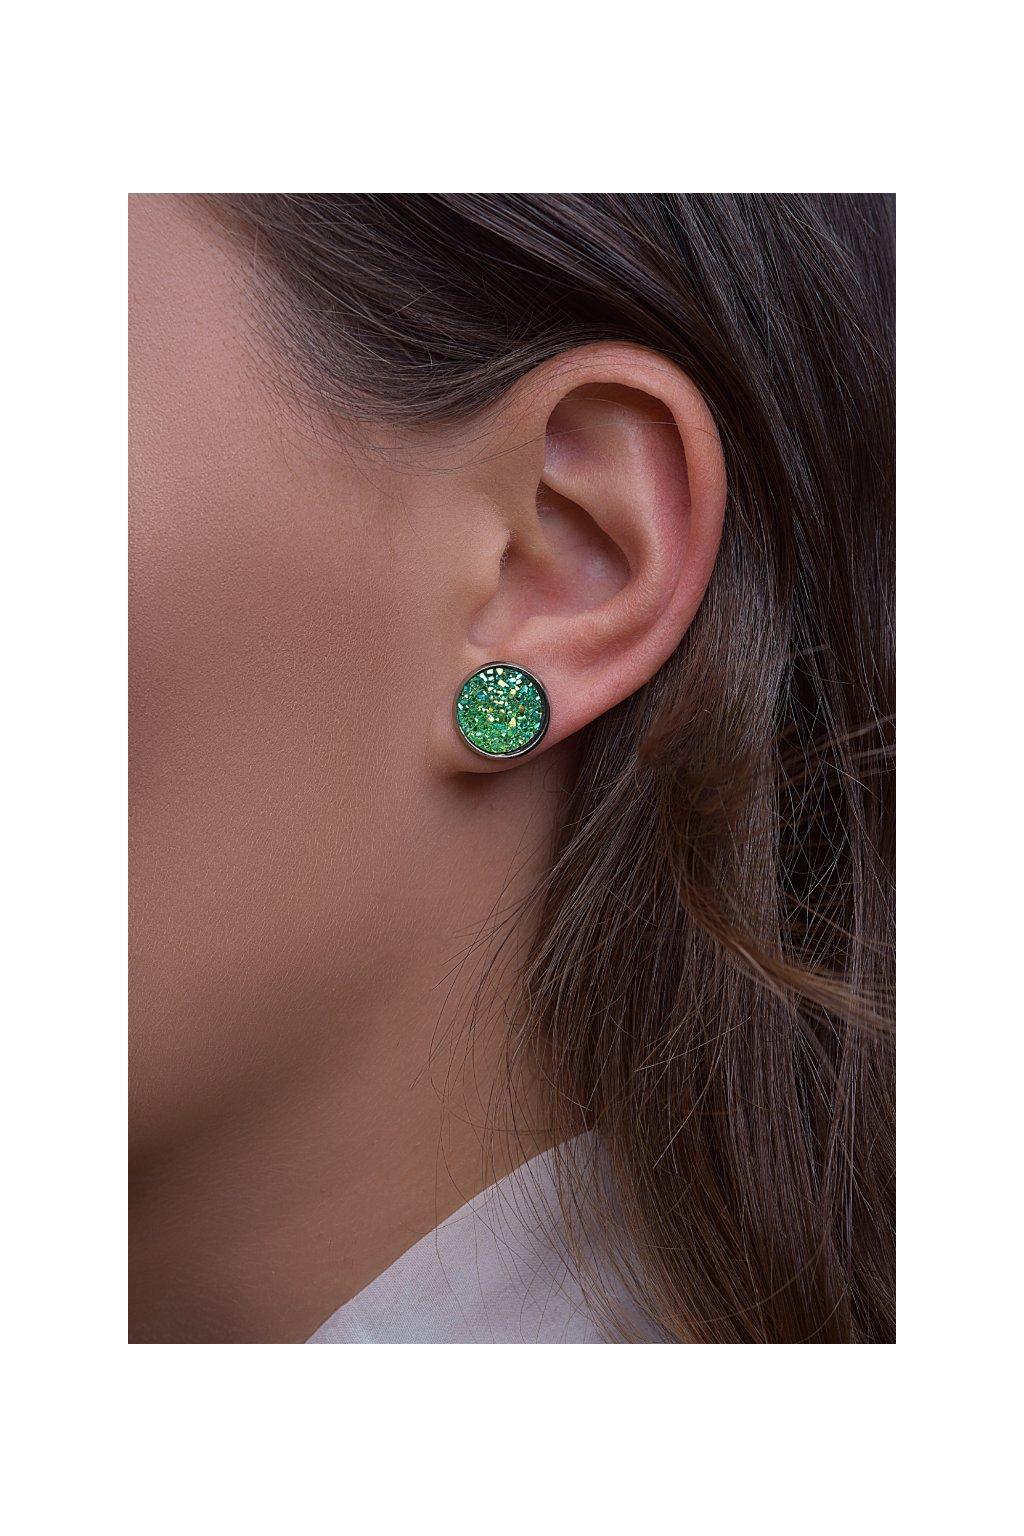 Nausnice Green Dragon eye (zelene draci oko) 2